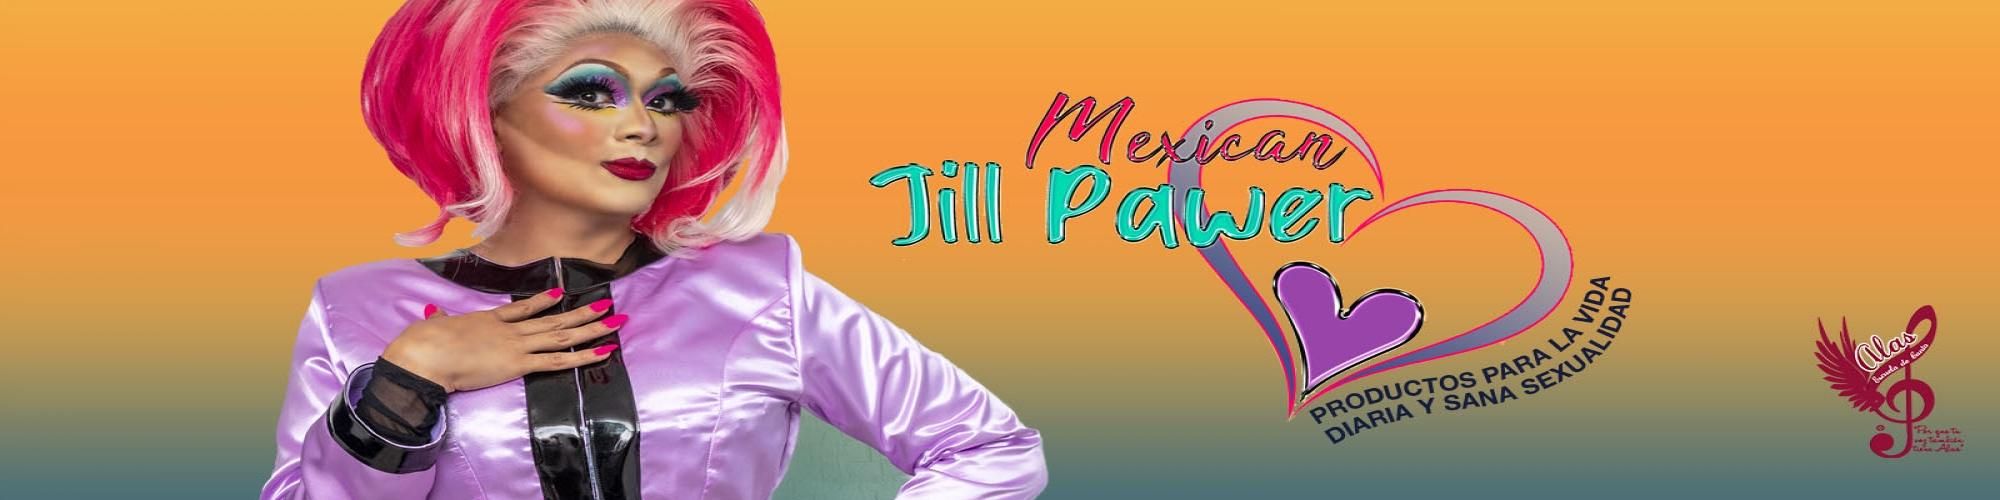 Mexican Jill pawer